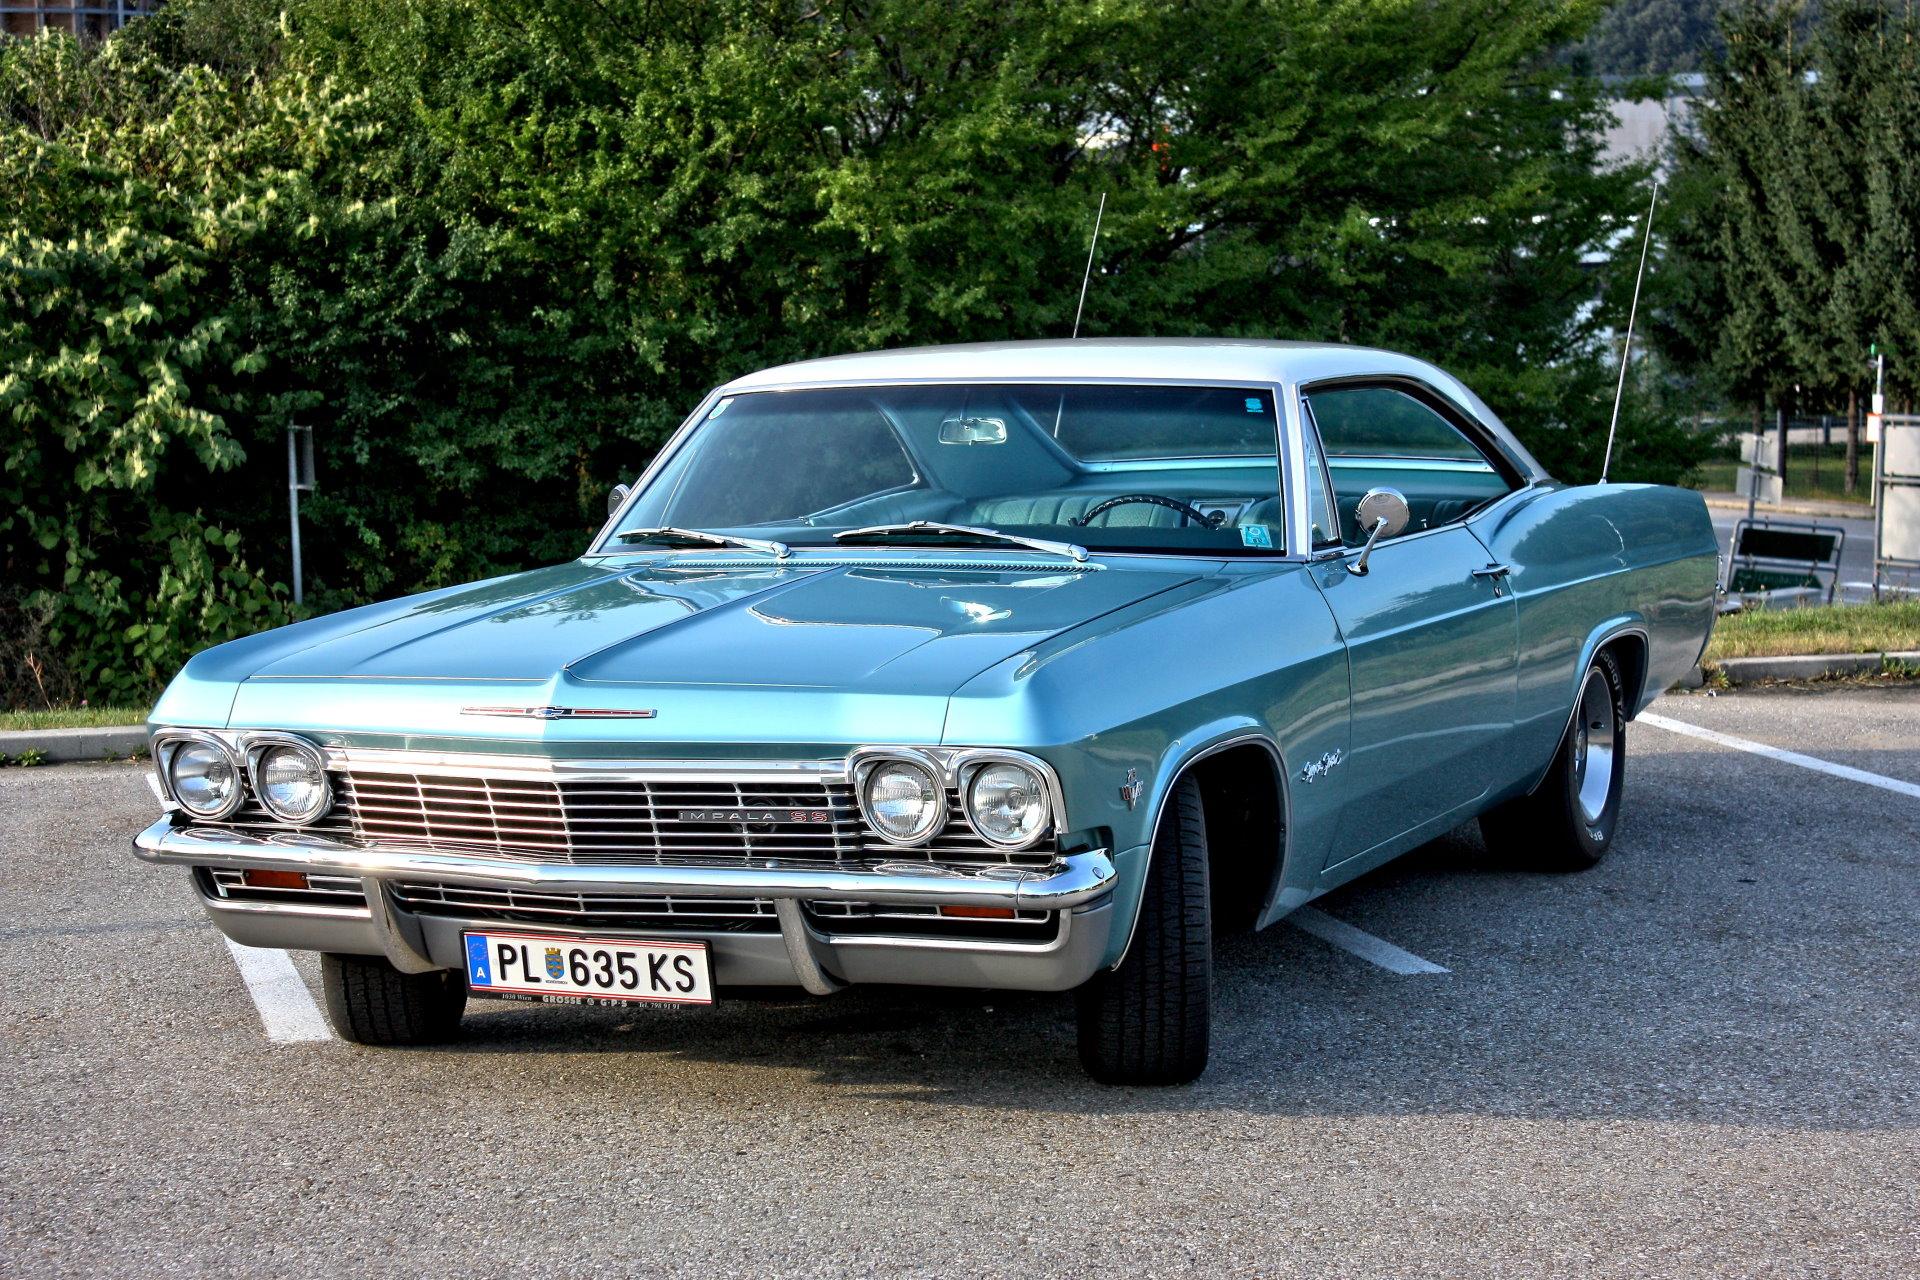 X moreover Impala also Dscn additionally Chevrolet Impala additionally . on 1956 chevrolet chevy impala